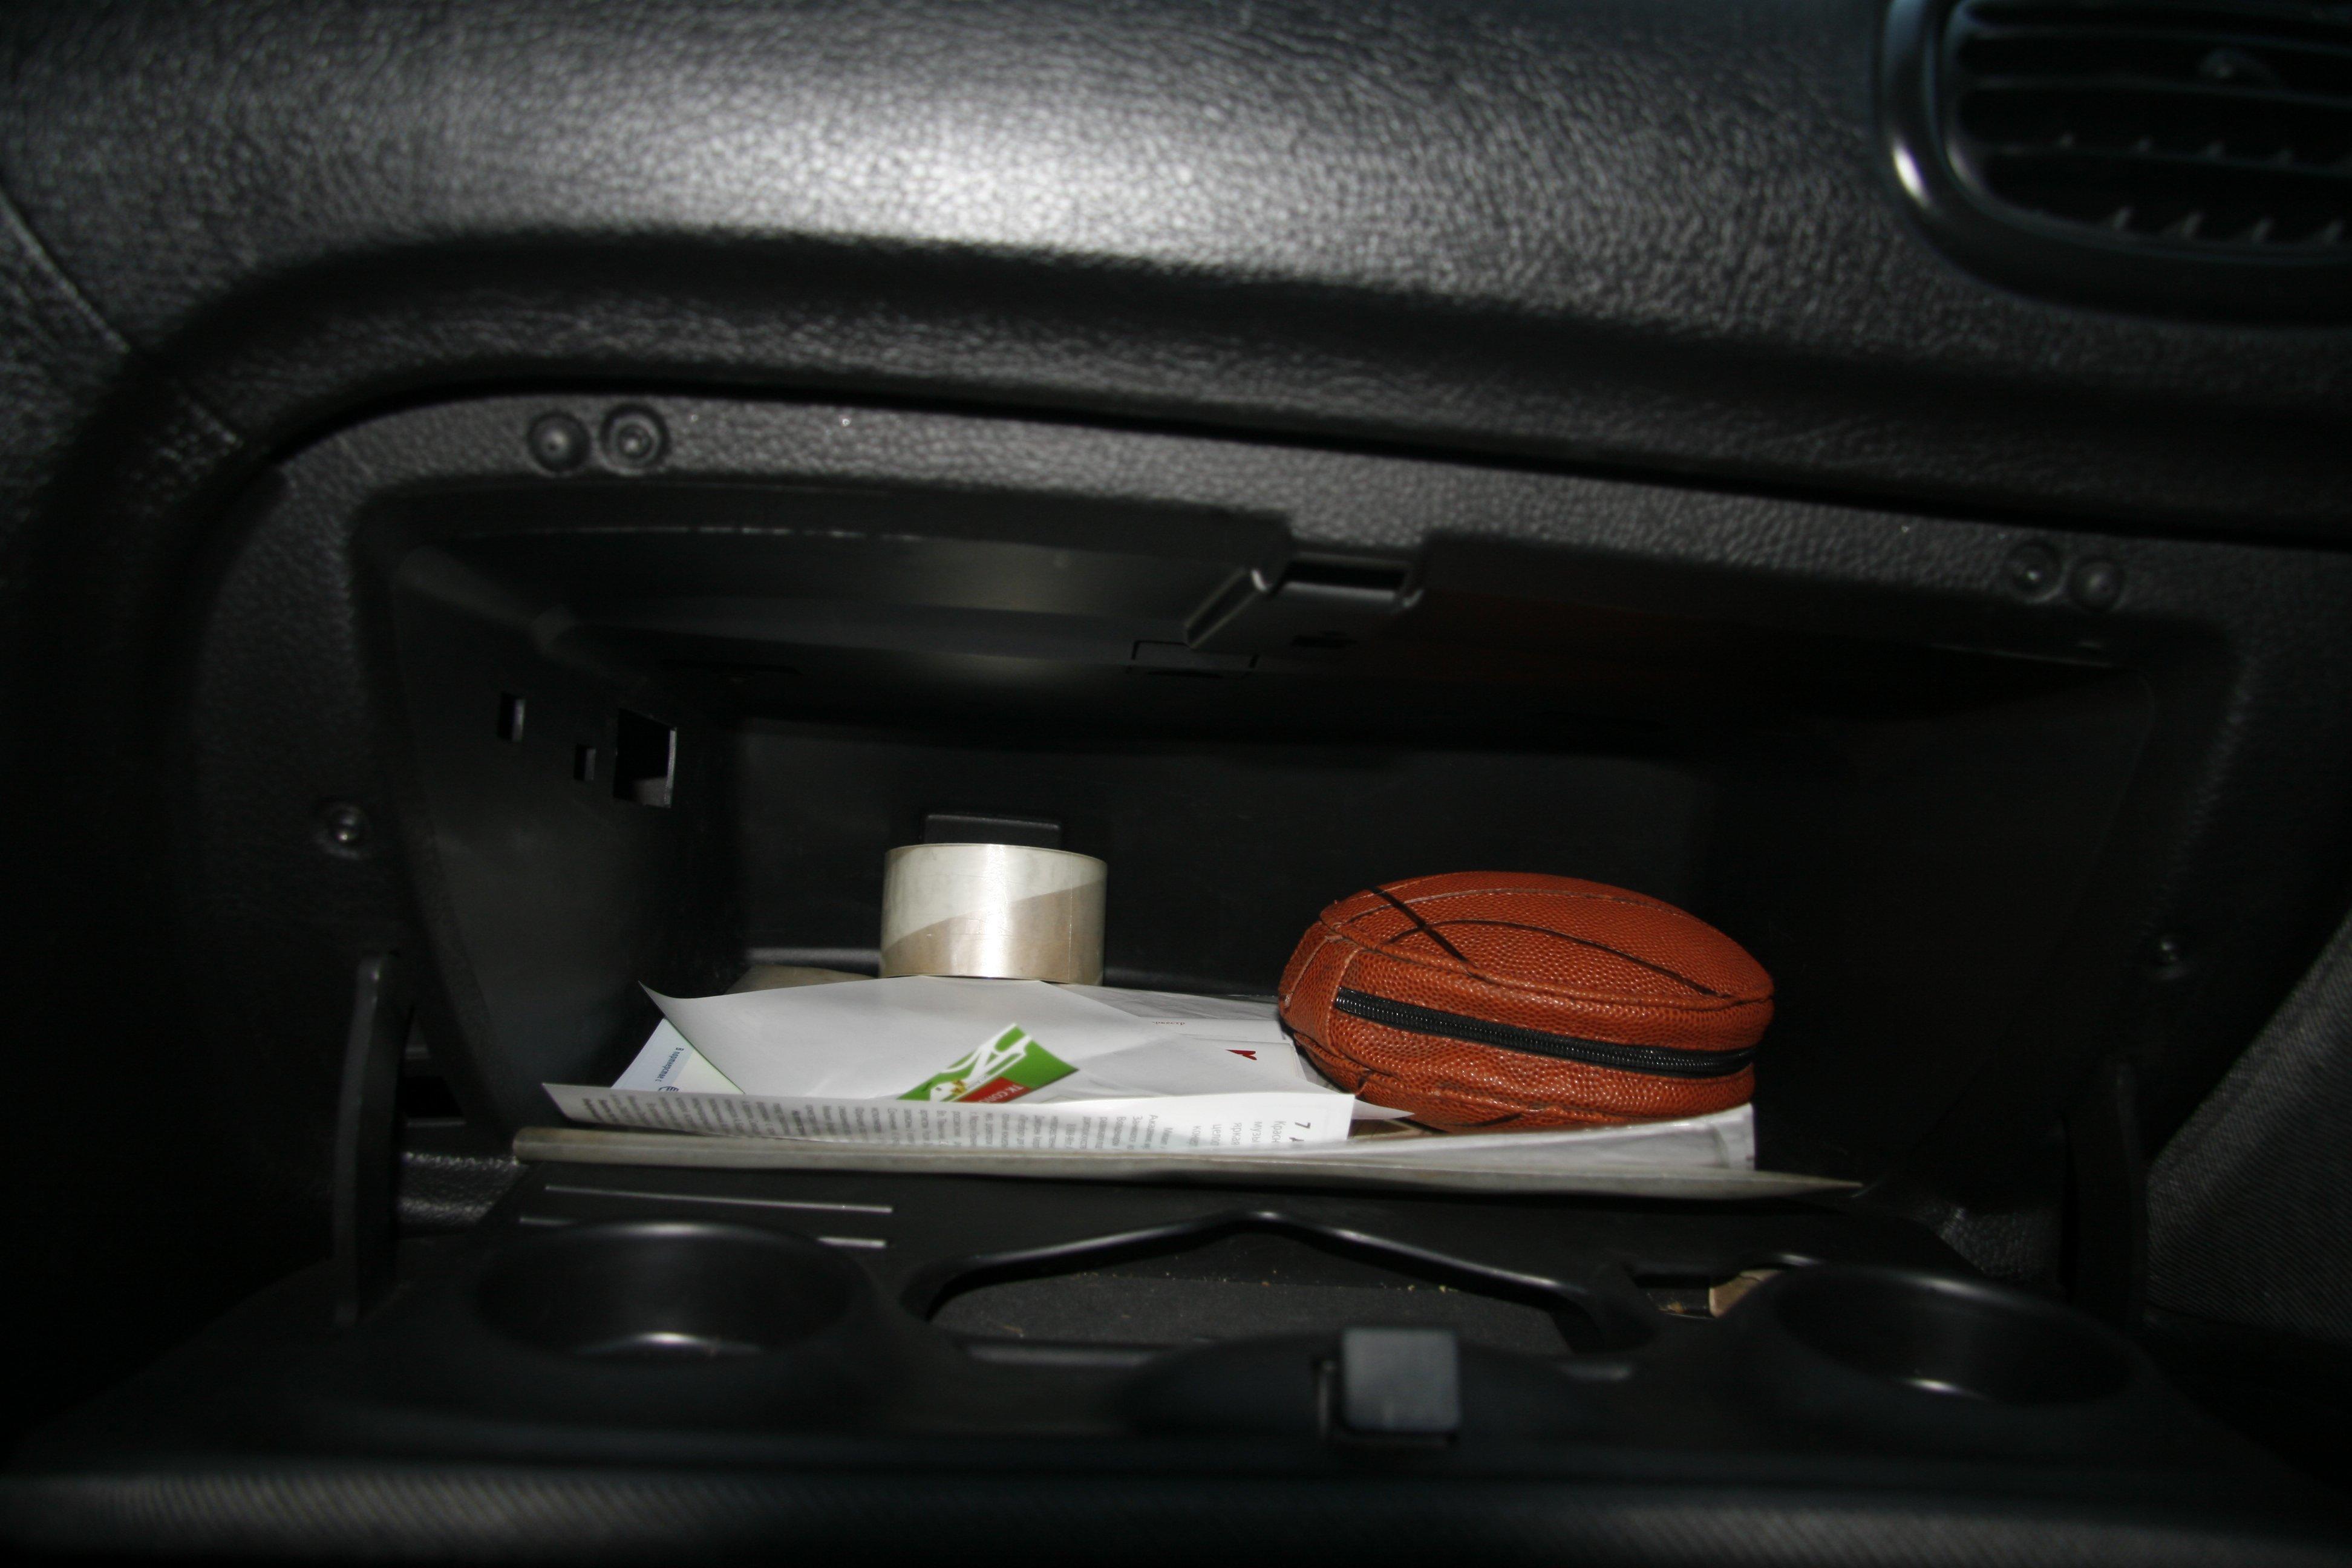 руководство по ремонту и эксплуатации форд мондео 1994